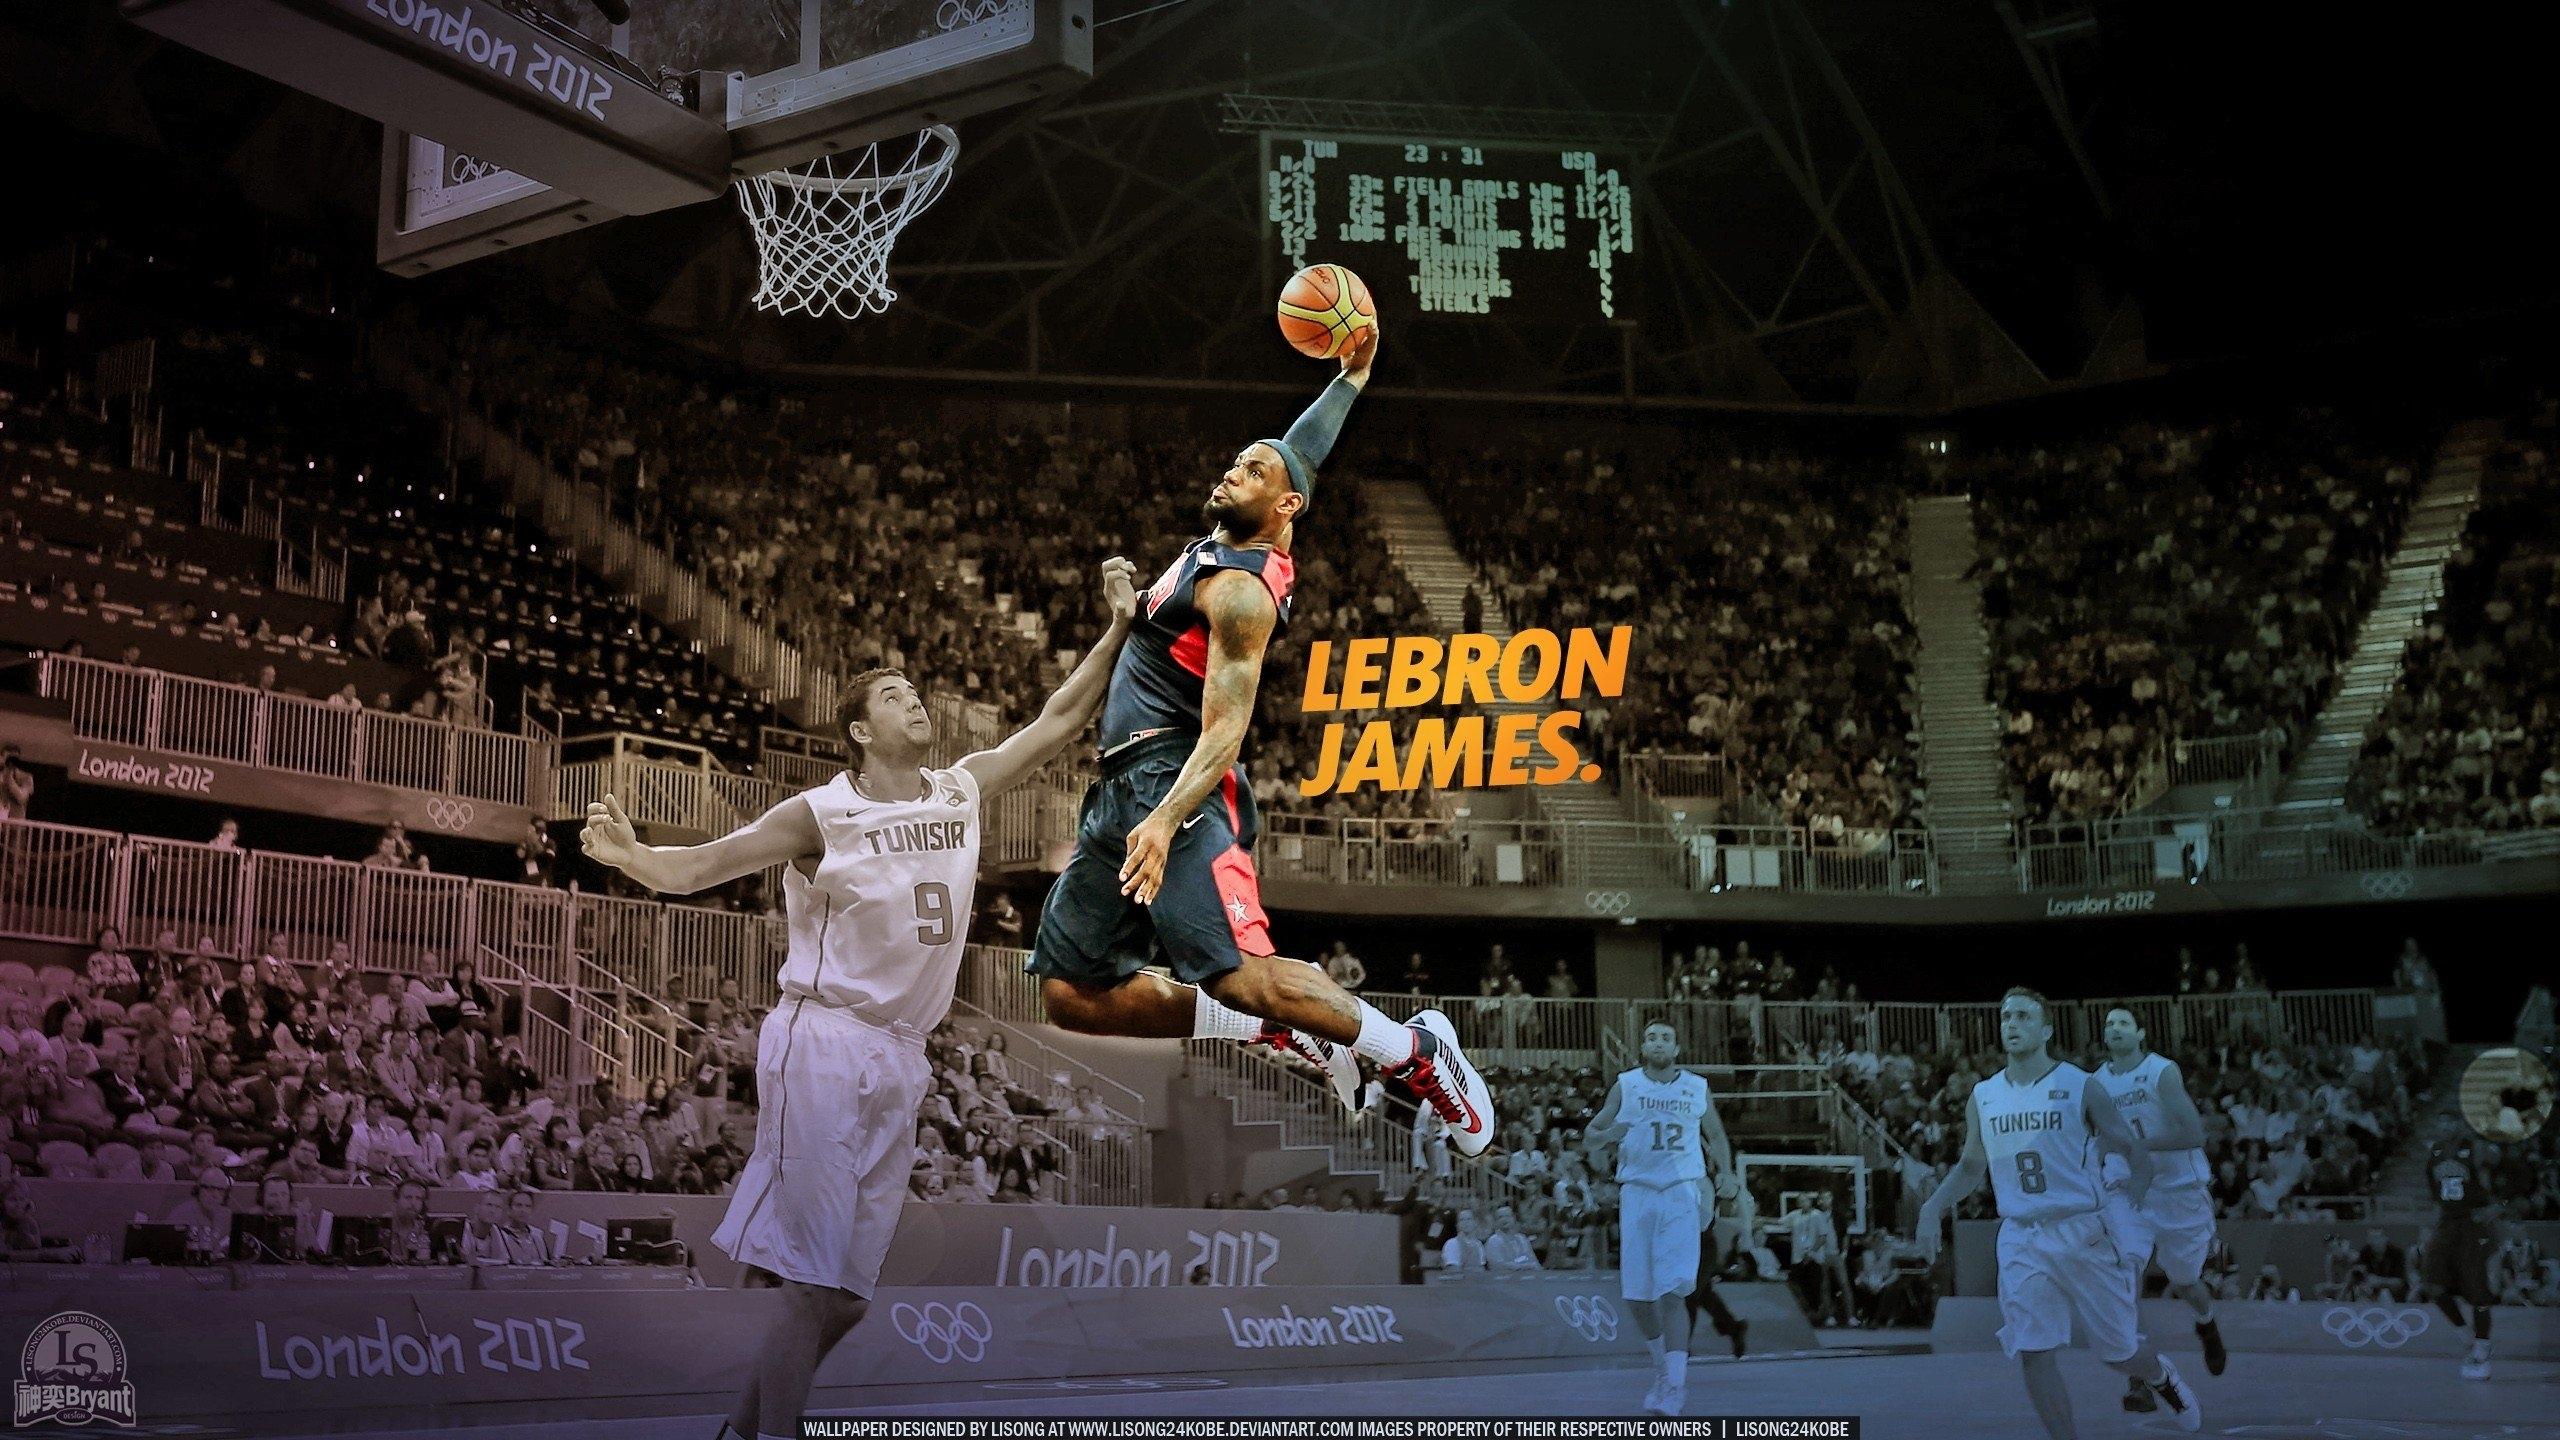 lebron james dunk wallpapers 1080p ~ desktop wallpaper box